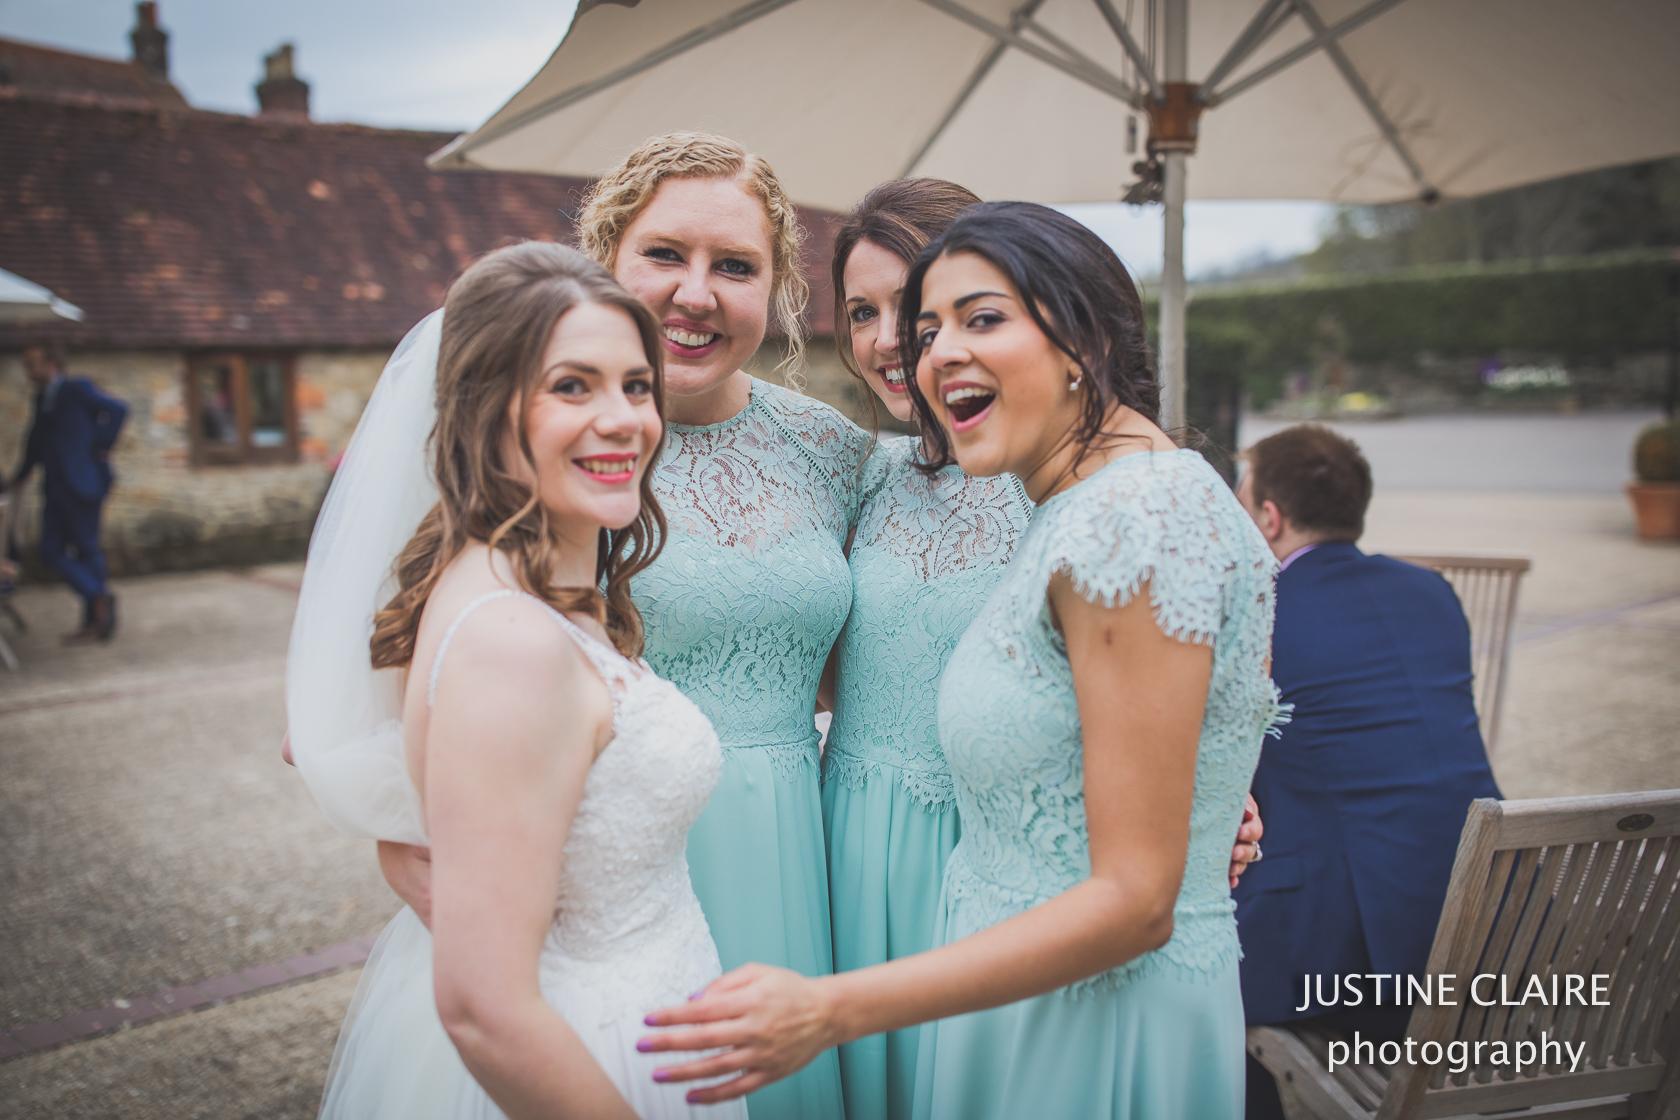 Fitzleroi Fittleworth petworth Billingshurst farm Wedding Photography by Justine Claire photographer Arundel Worthing Brighton-39.jpg